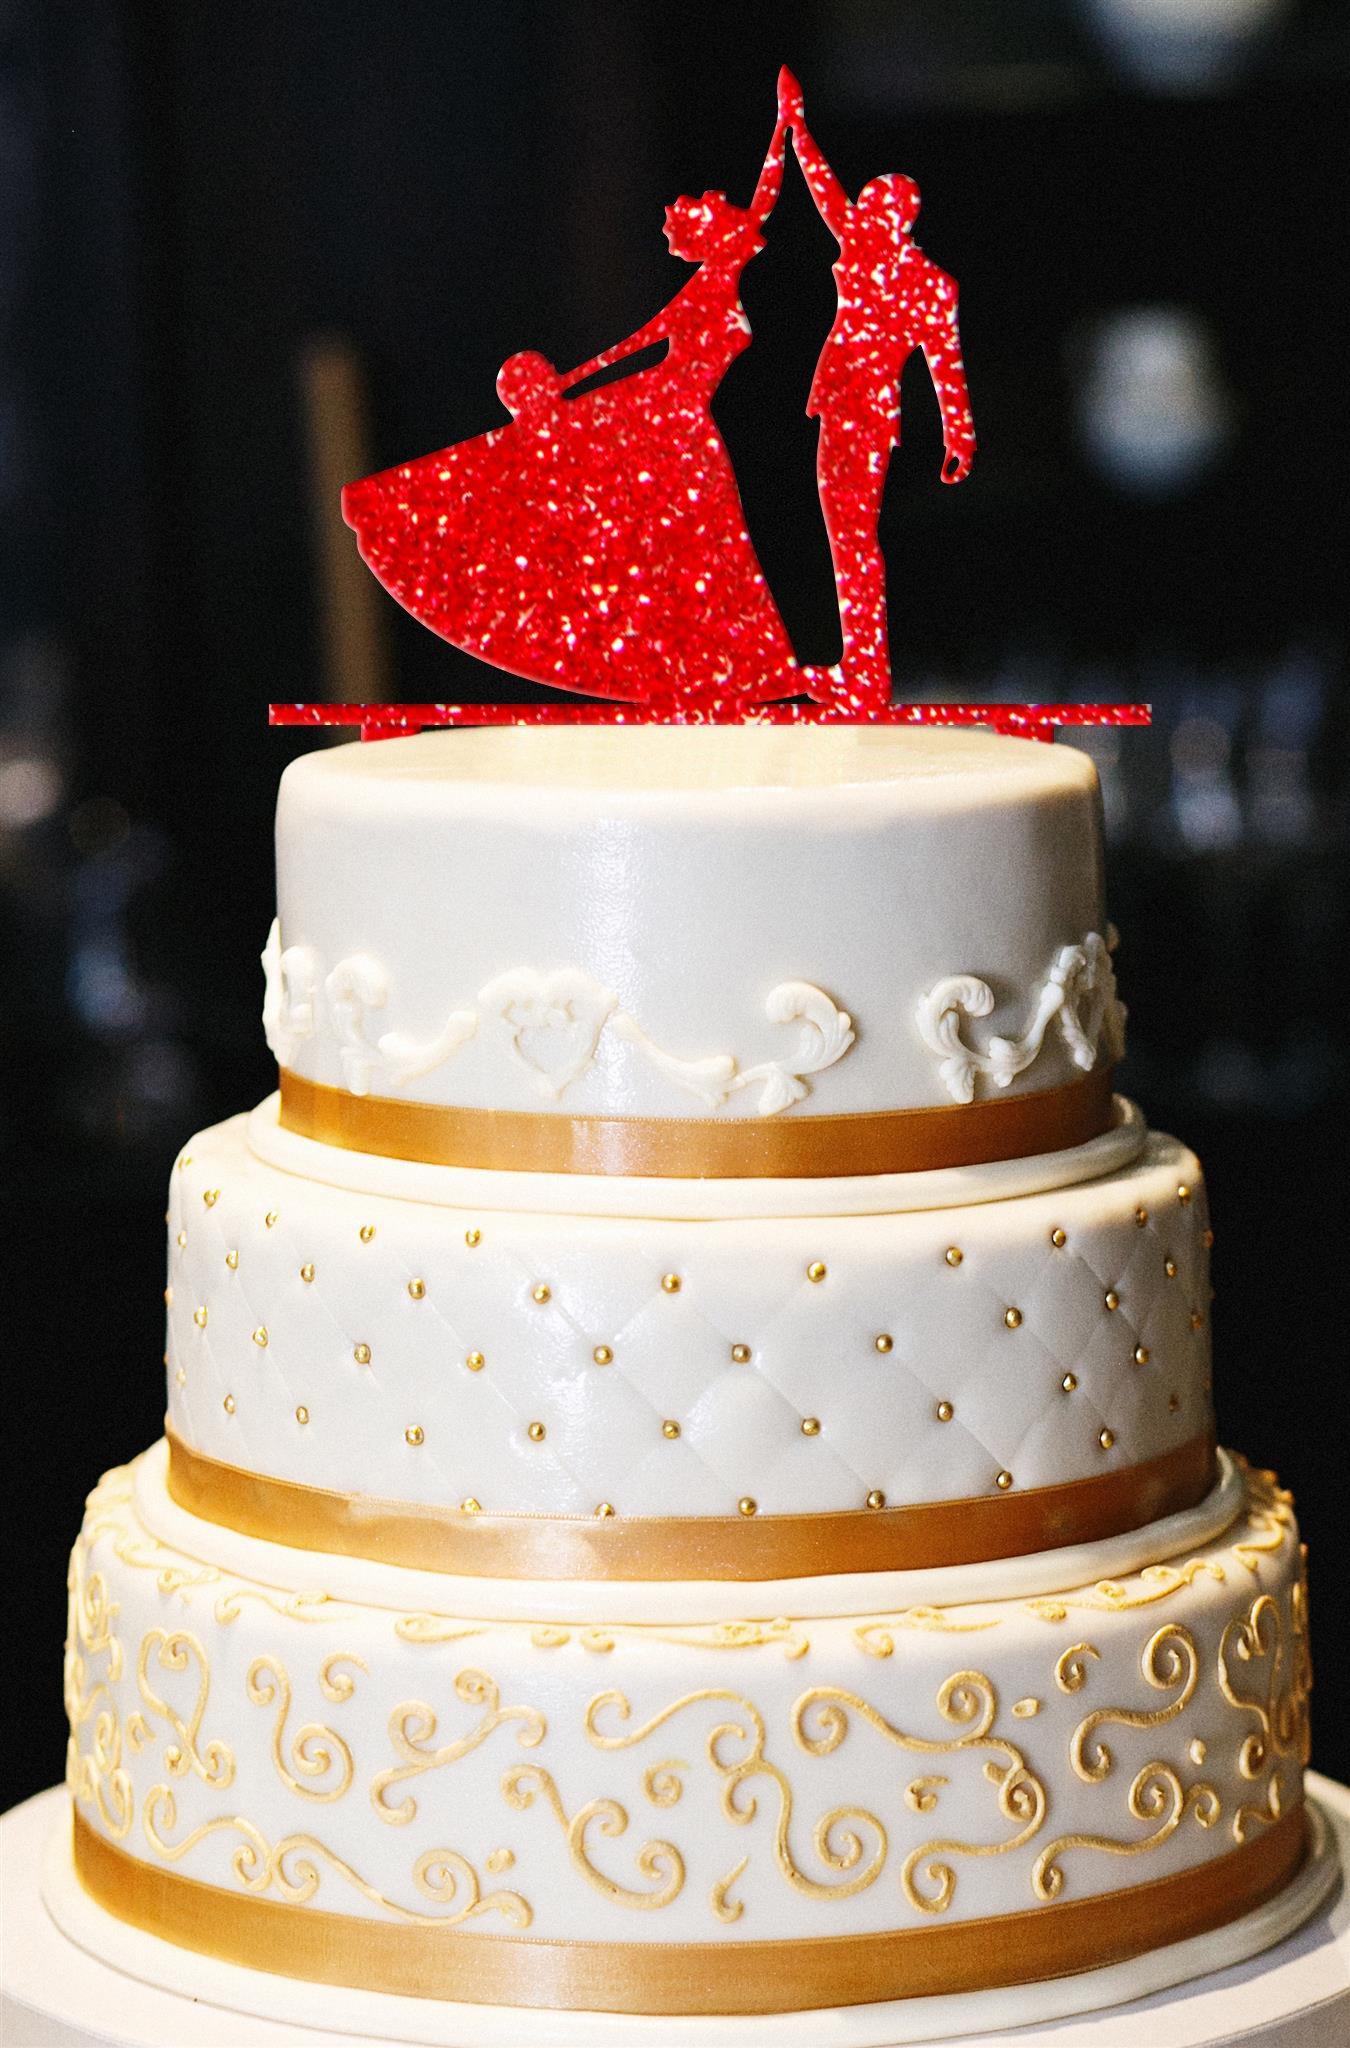 High Five Wedding Cake Topper, Wedding Cake Topper, Engagement Cake Topper, Anniversary Cake Topper, Gold Cake Topper, Gold Glitter Topper (15'', Glitter Red)